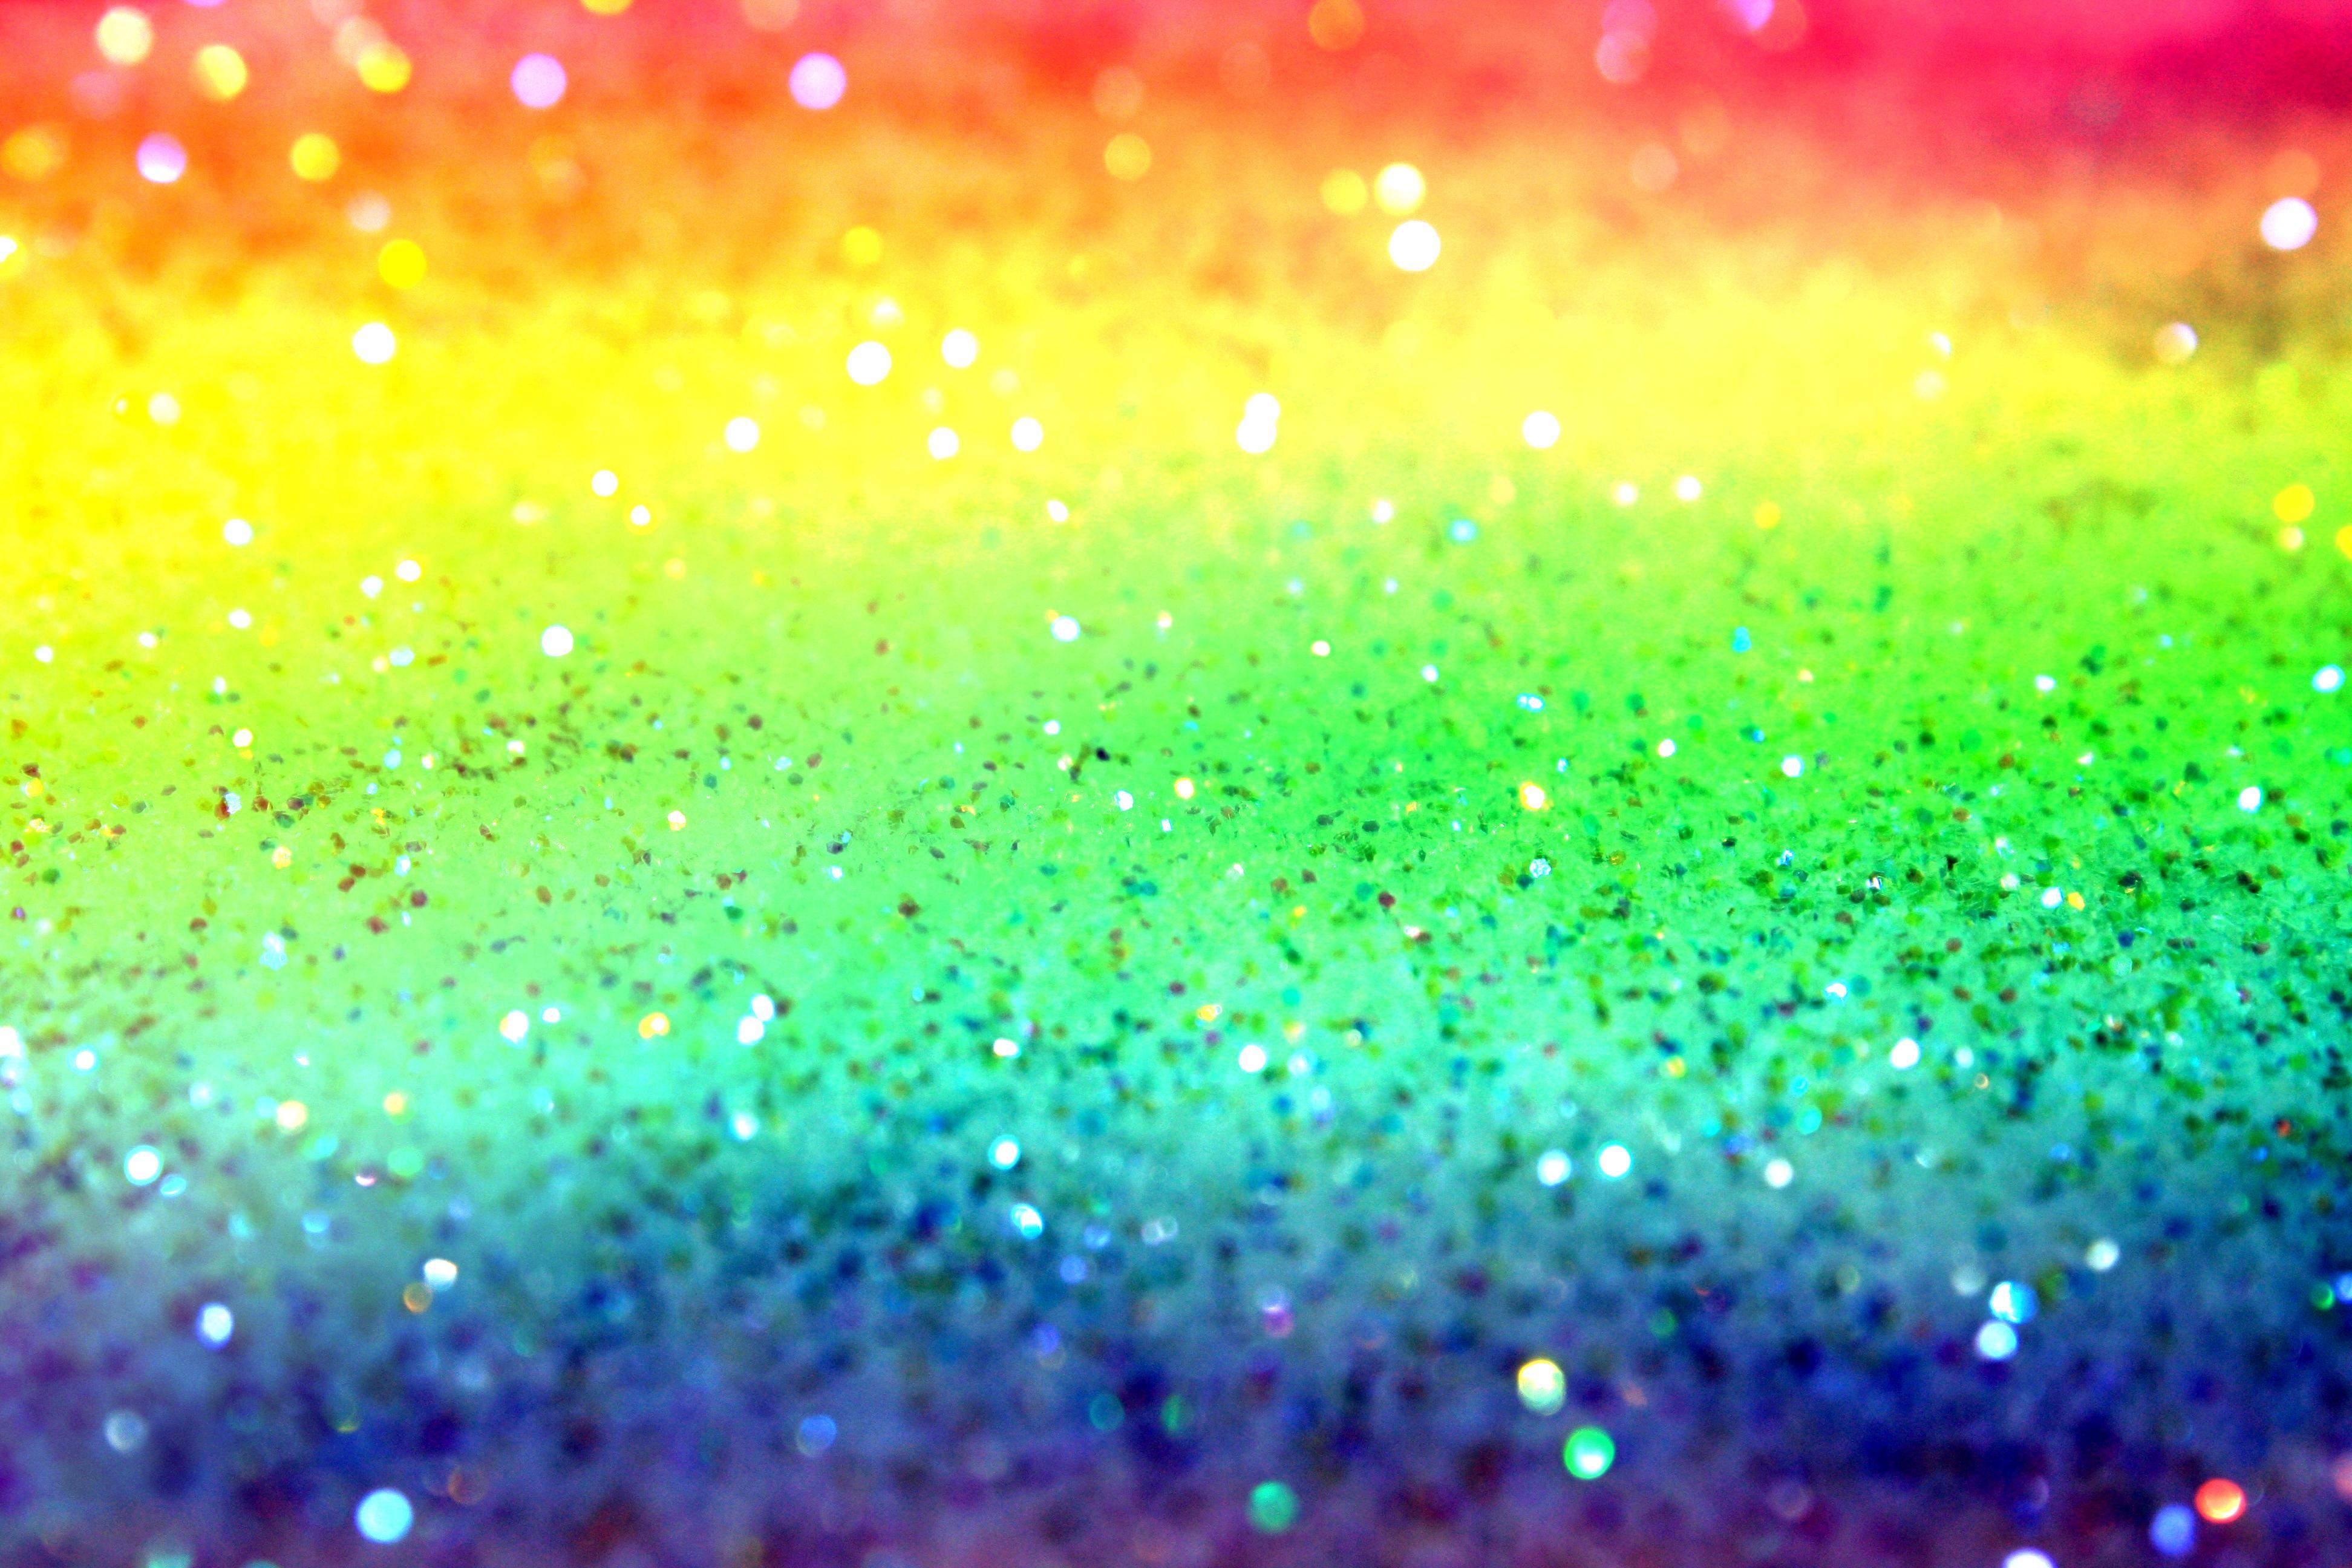 rainbow glider wallpaper - photo #11